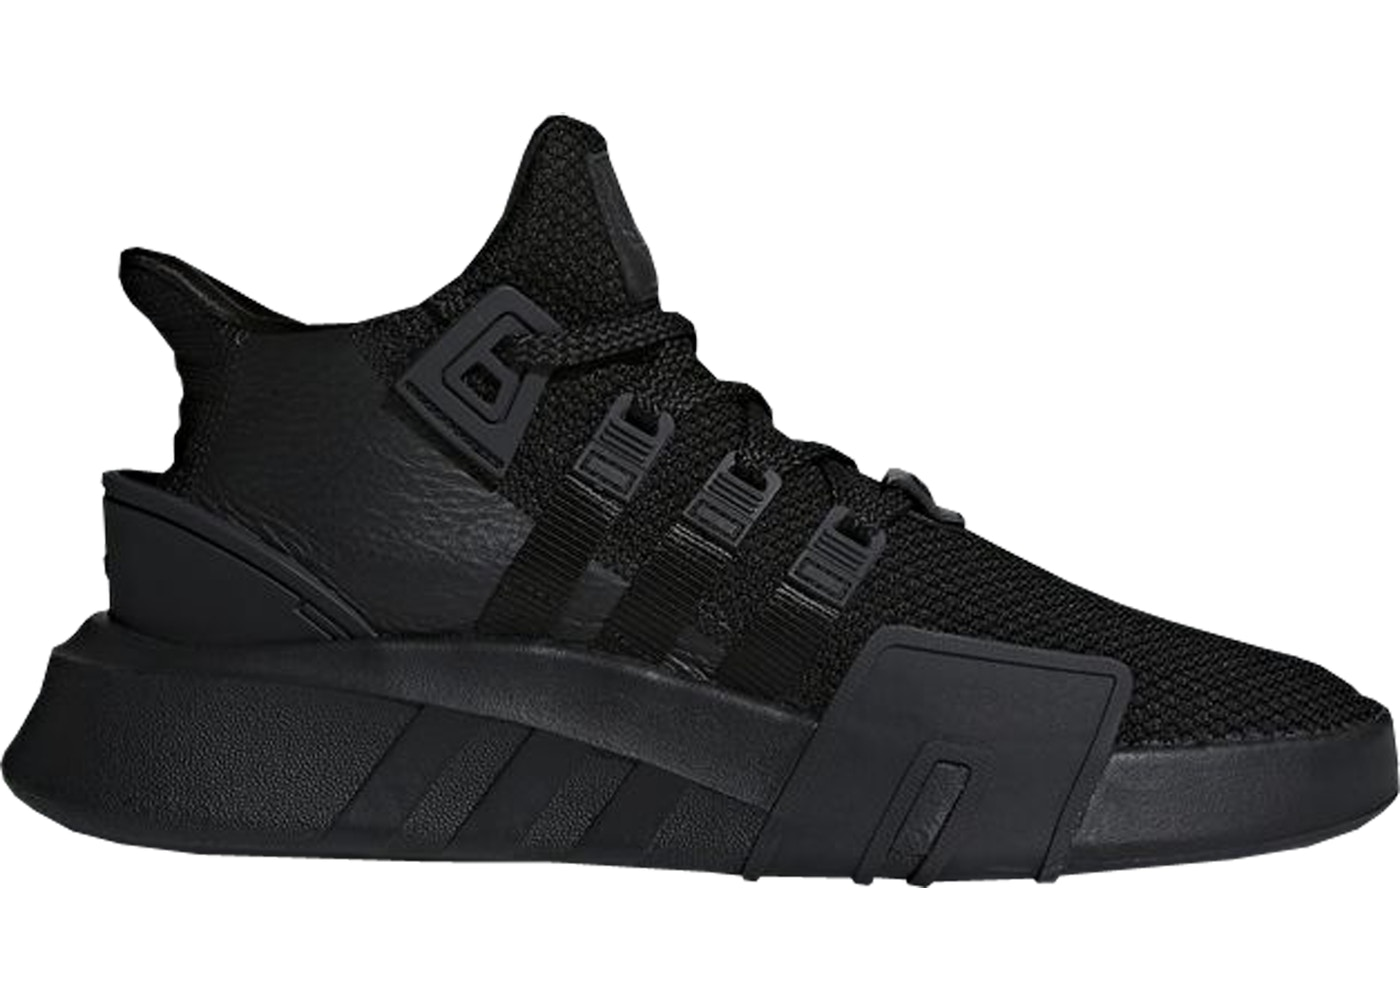 adidas EQT Basketball Adv Triple Black - DA9537